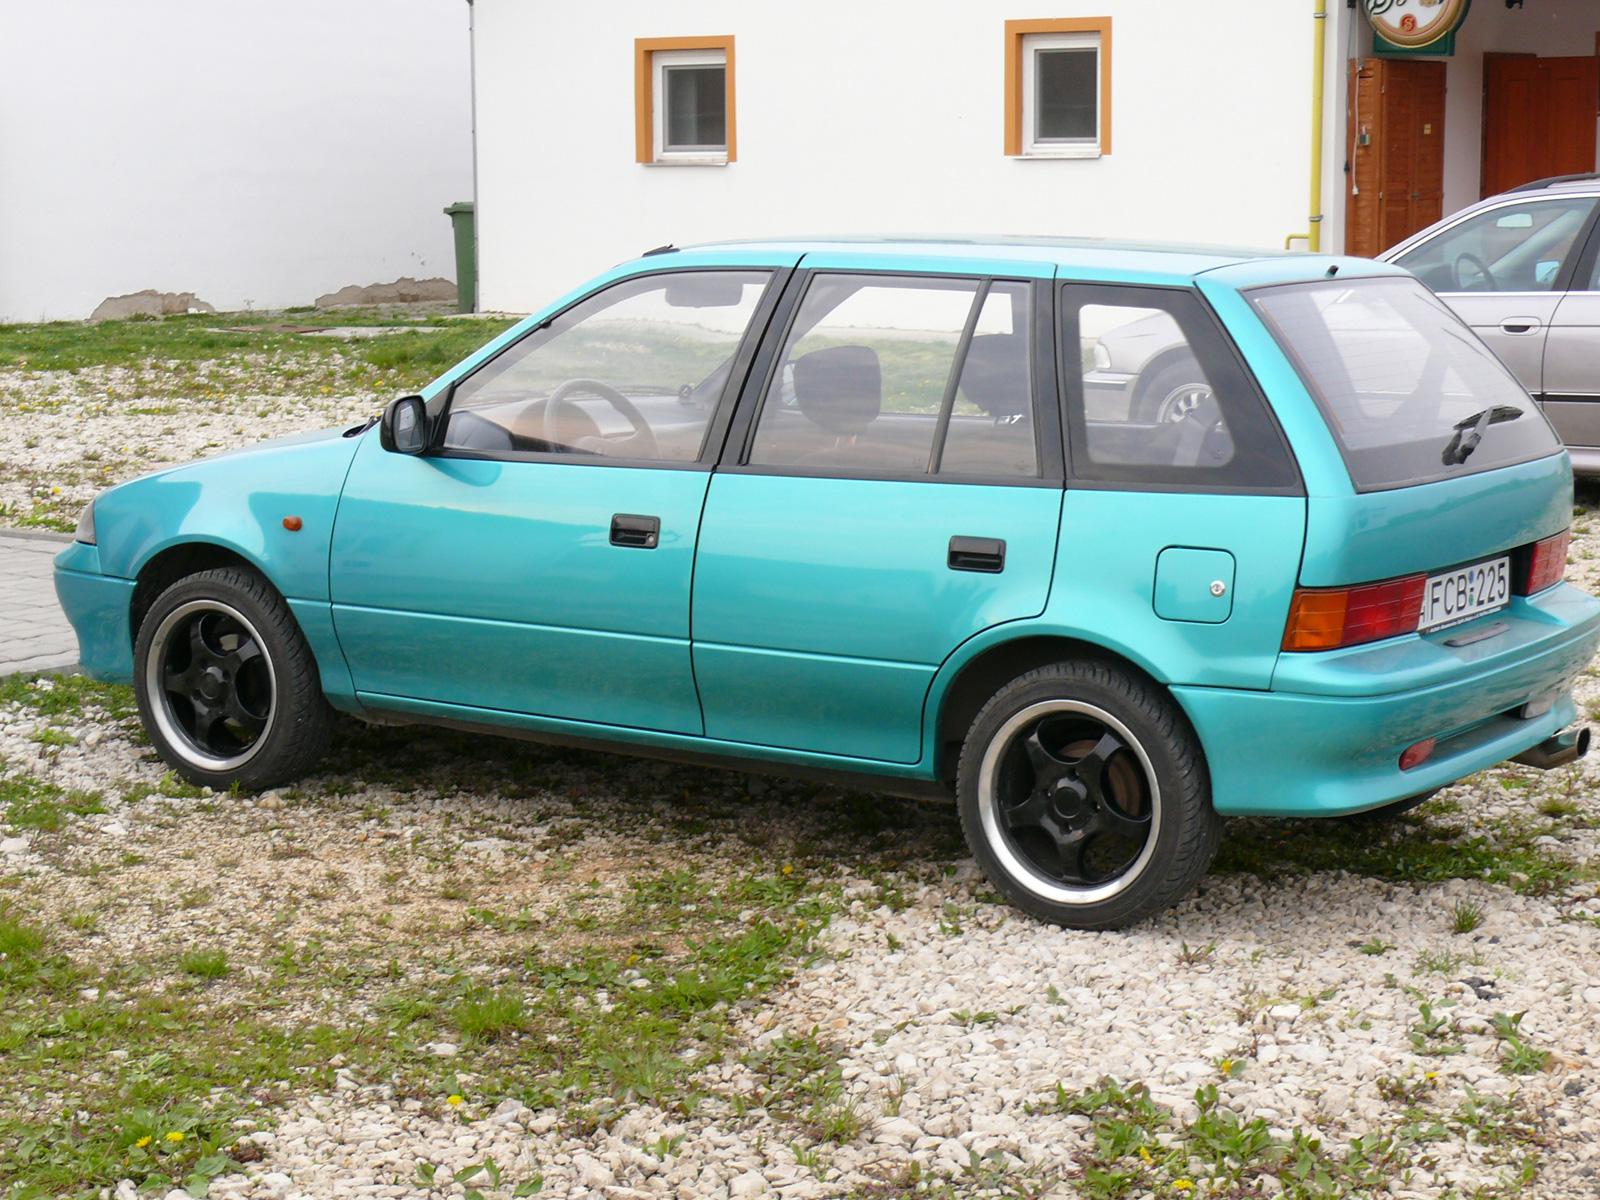 Suzuki Swift MK2 tuning (Kszajga) - CARSTYLING COM :: Magyar